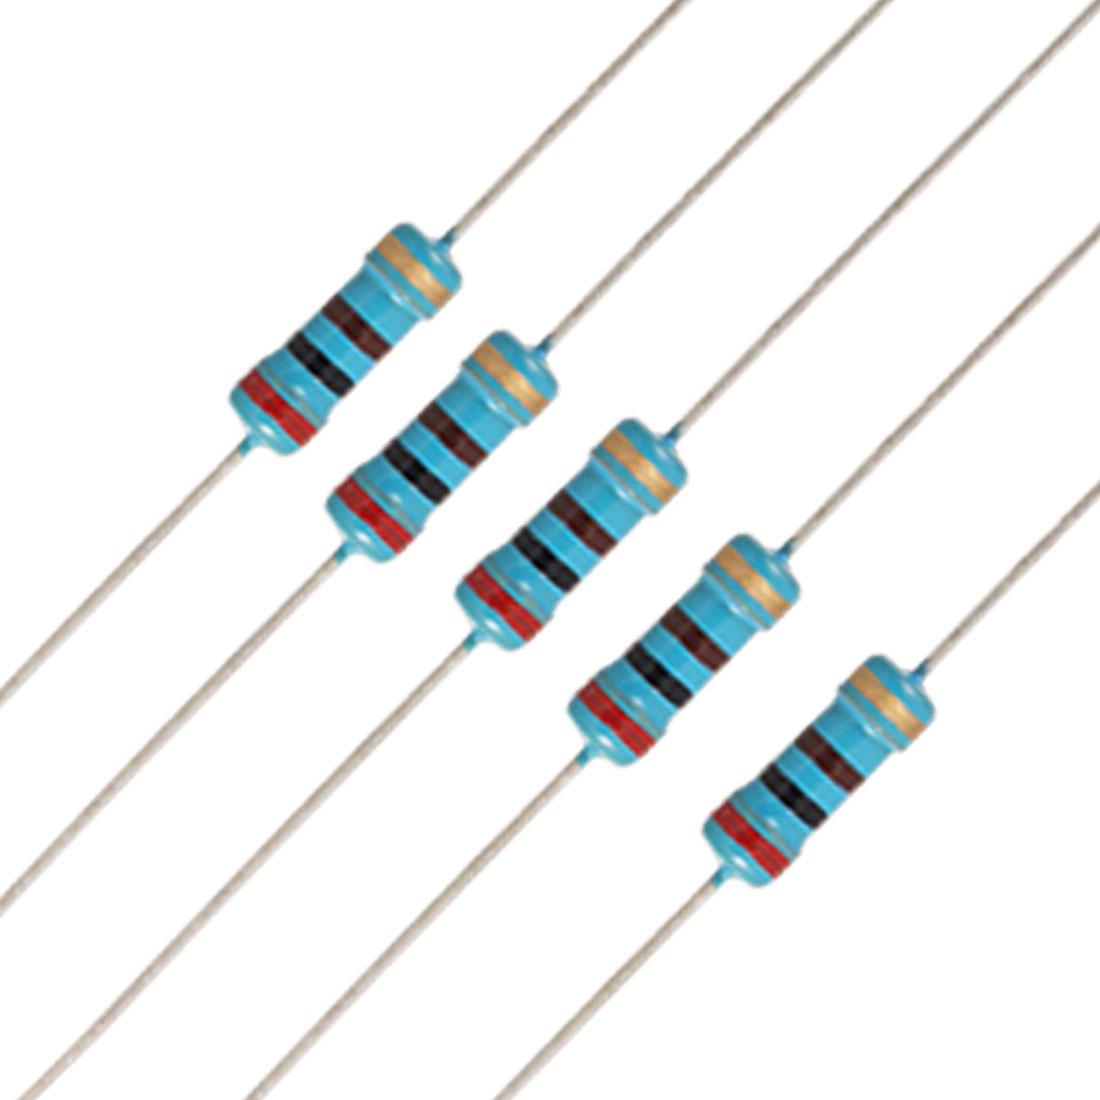 20 x 1/2W Watt 200 ohm 200R Carbon Film Resistor 0.5W